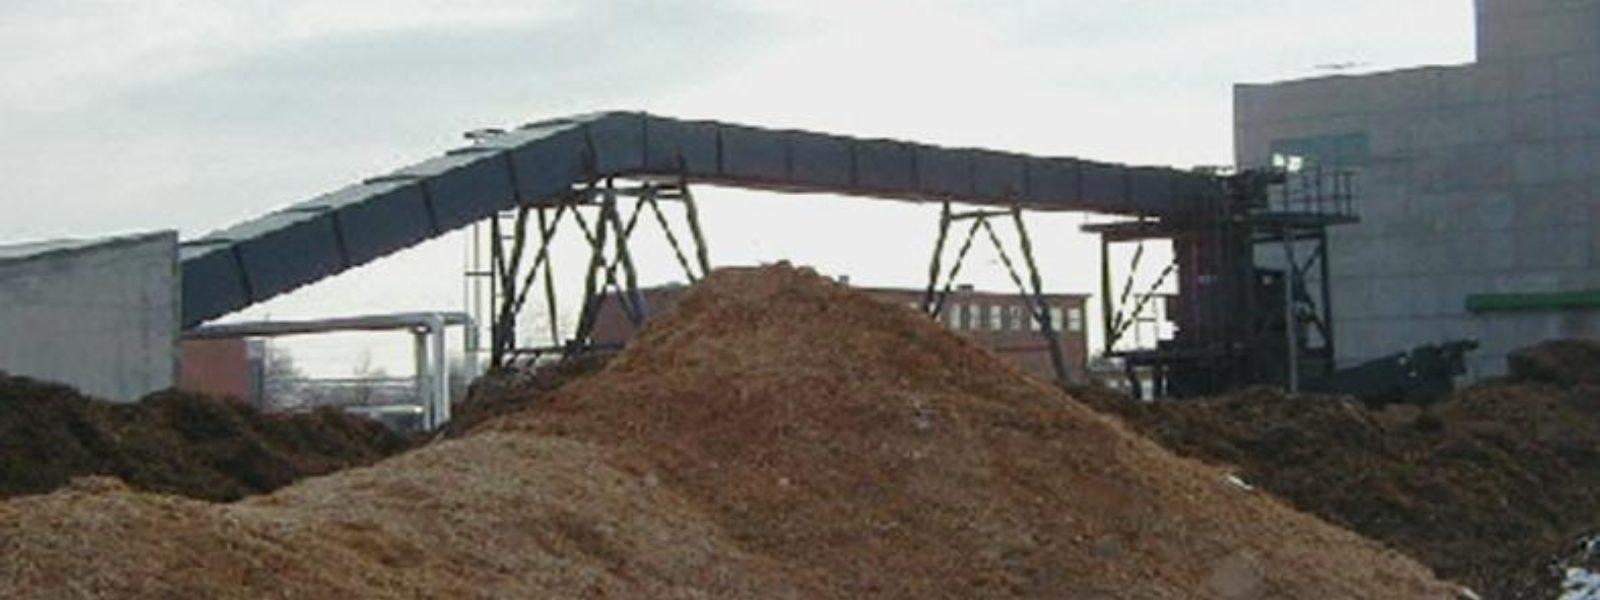 Scraper chain conveyors